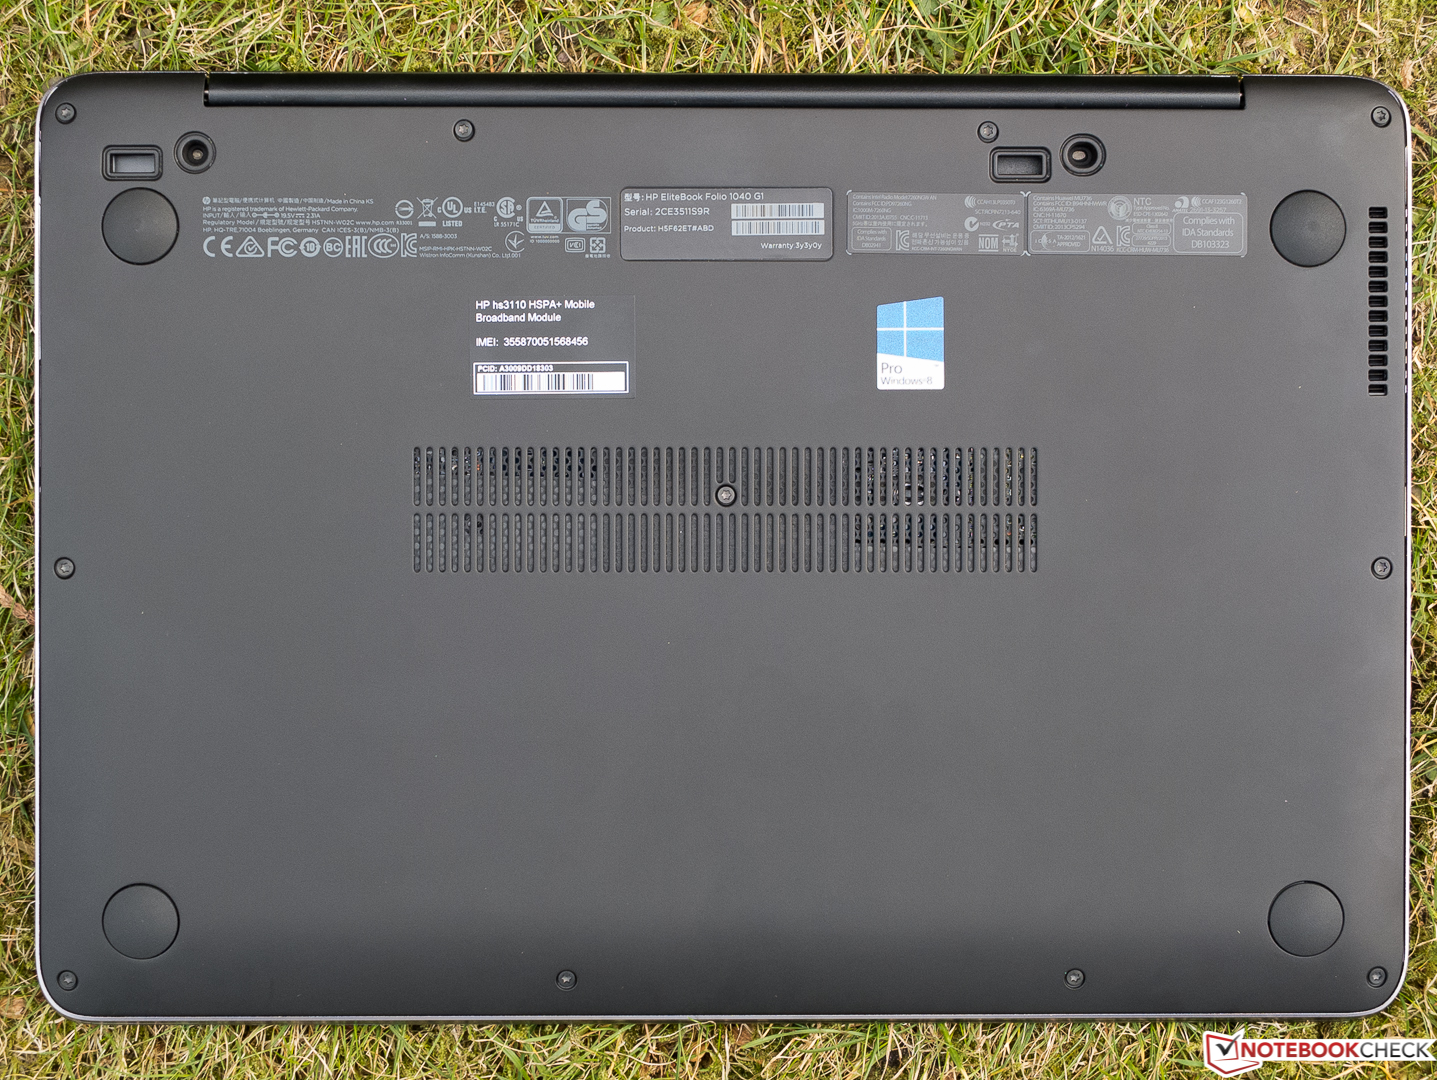 HP EliteBook Folio 1040 G2 Ultrabook Review - NotebookCheck